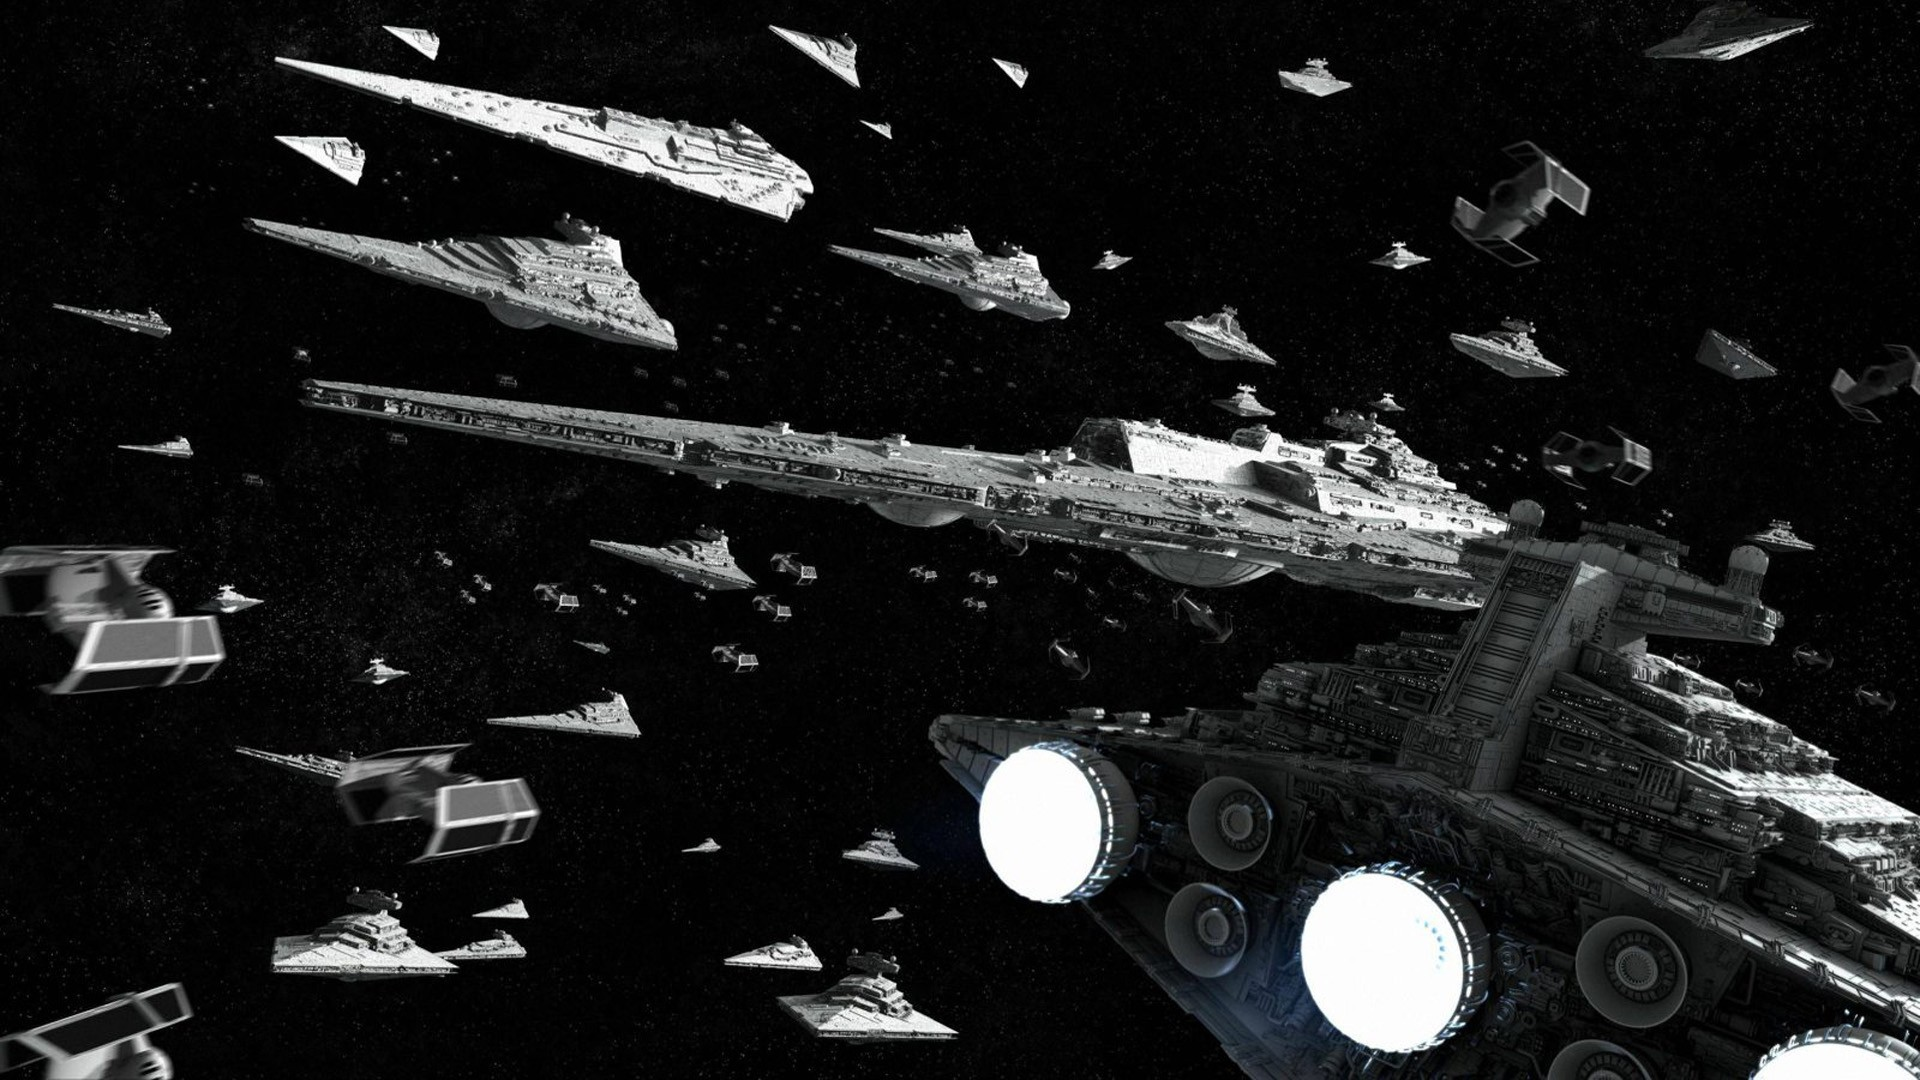 Galactic Republic Symbol Desktop Wallpaper by swmand4 on DeviantArt